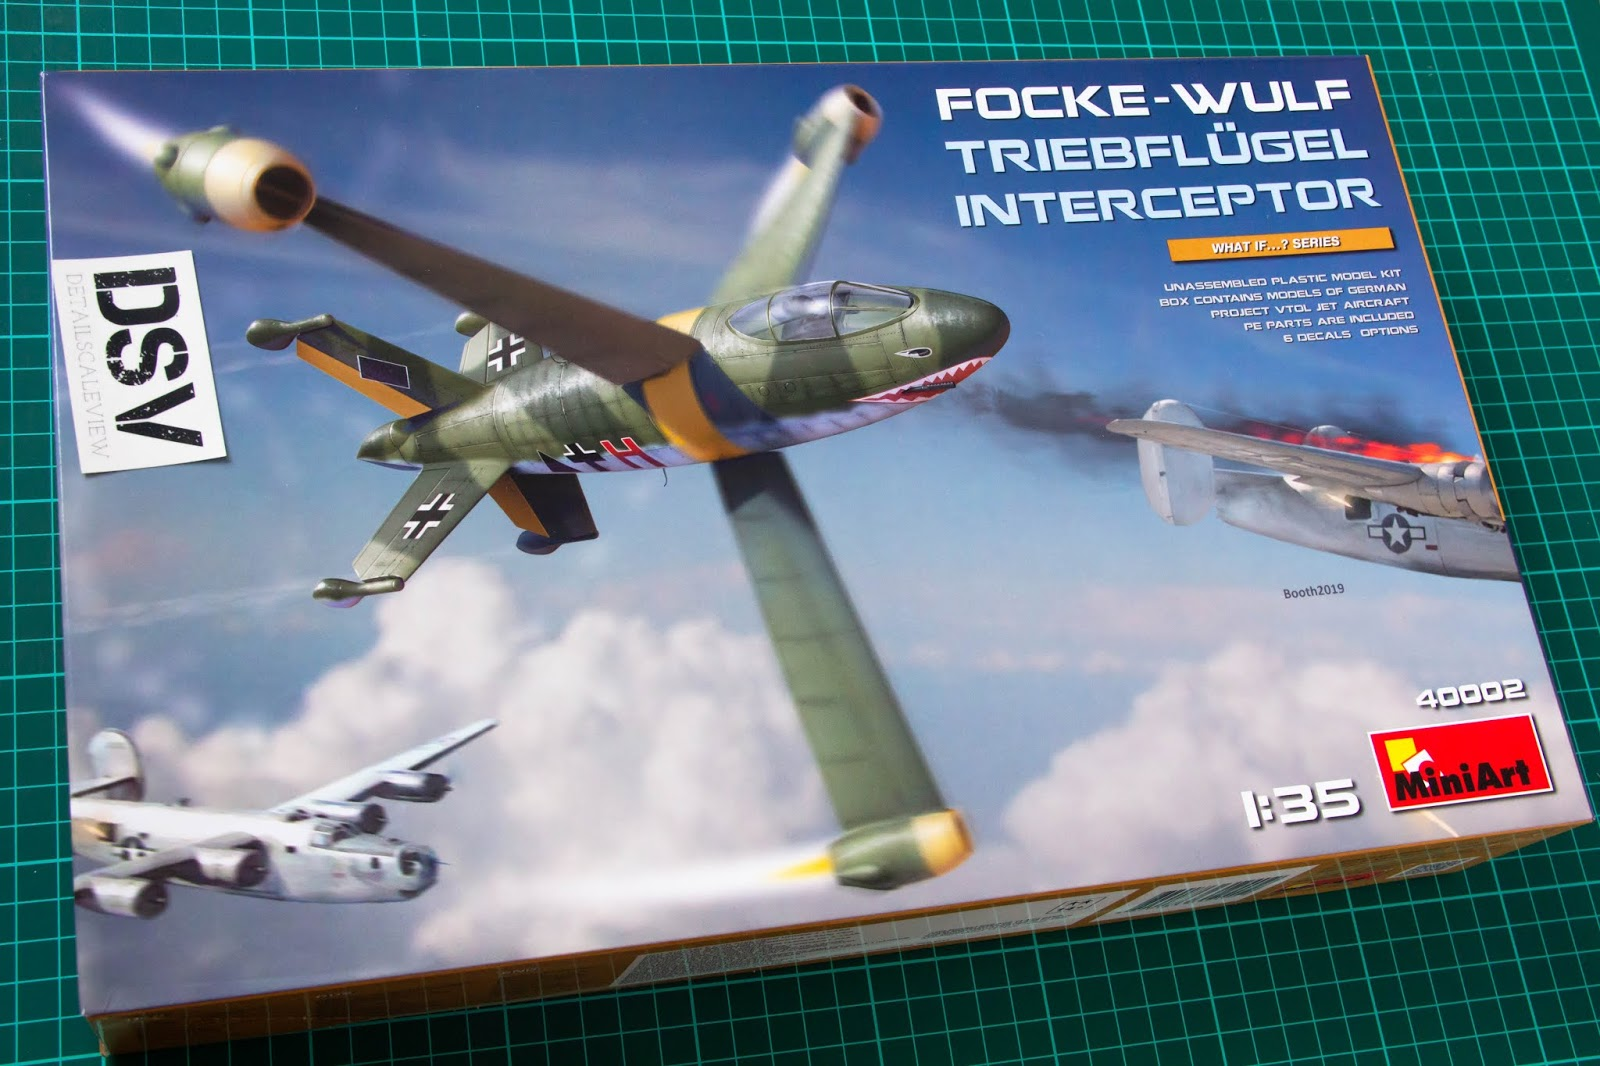 Neu Miniart 40002-1//35 Focke-Wulf Triebflügel Interceptor